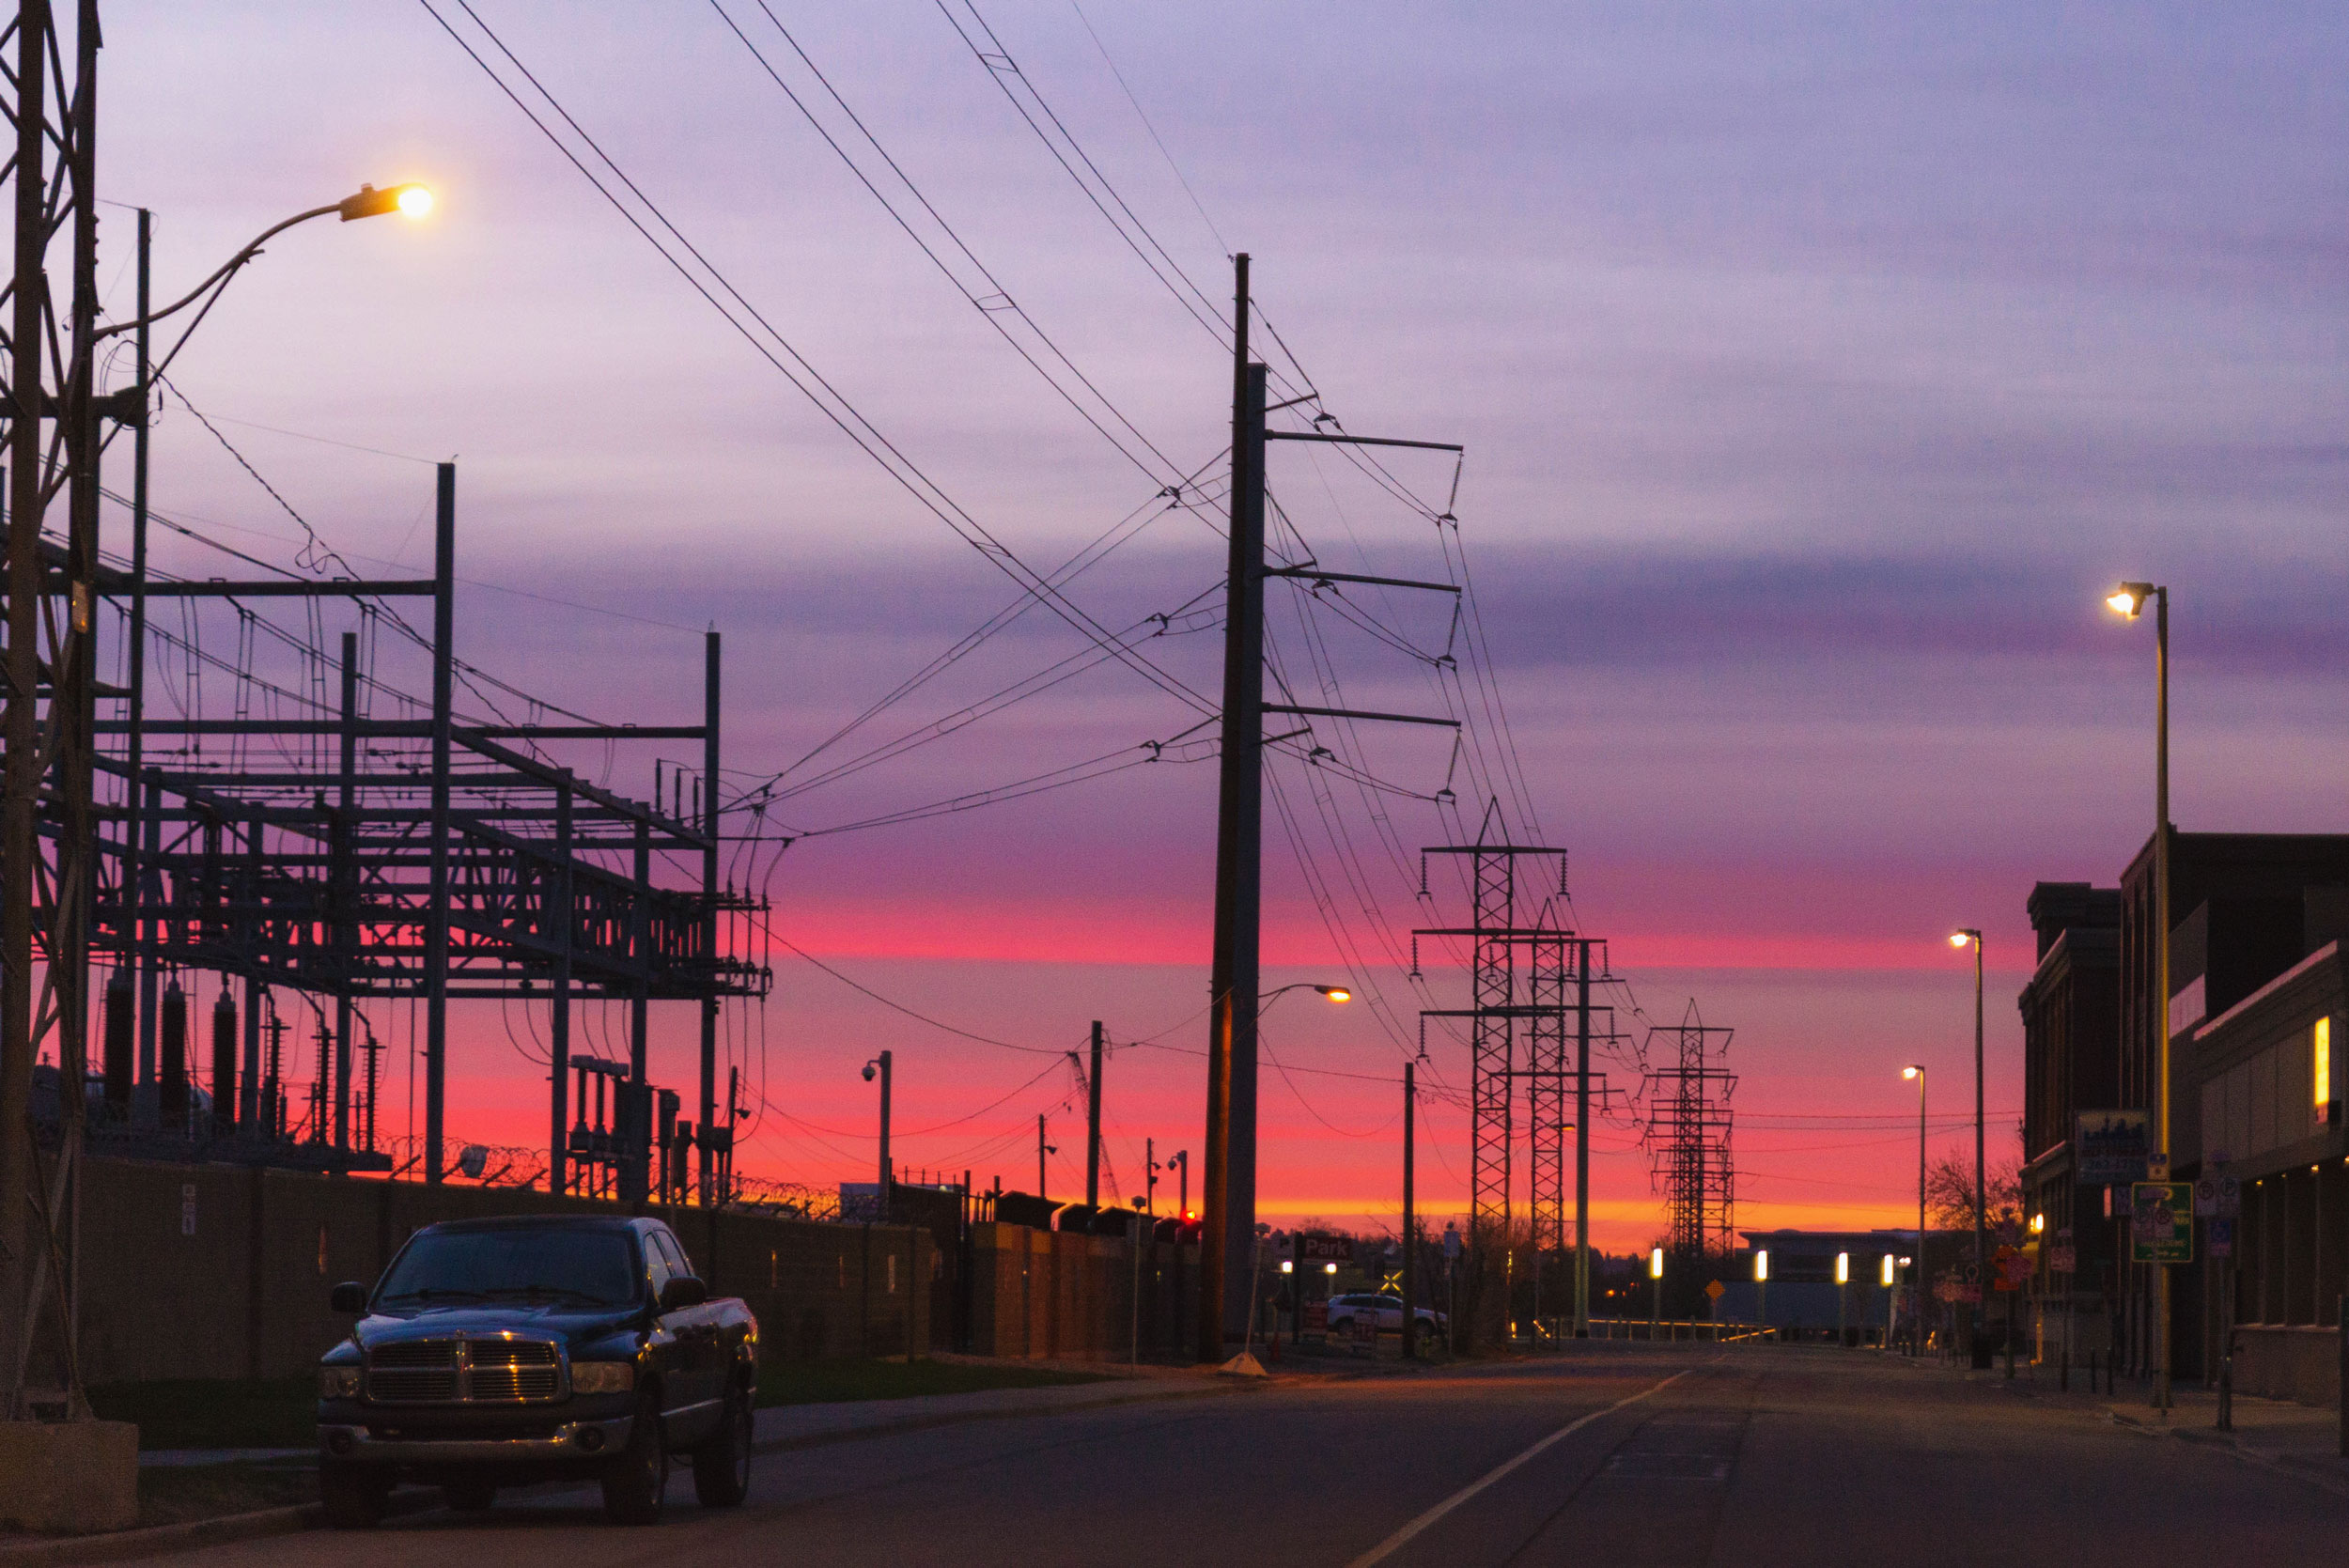 The Calgary sunrise was incredible.